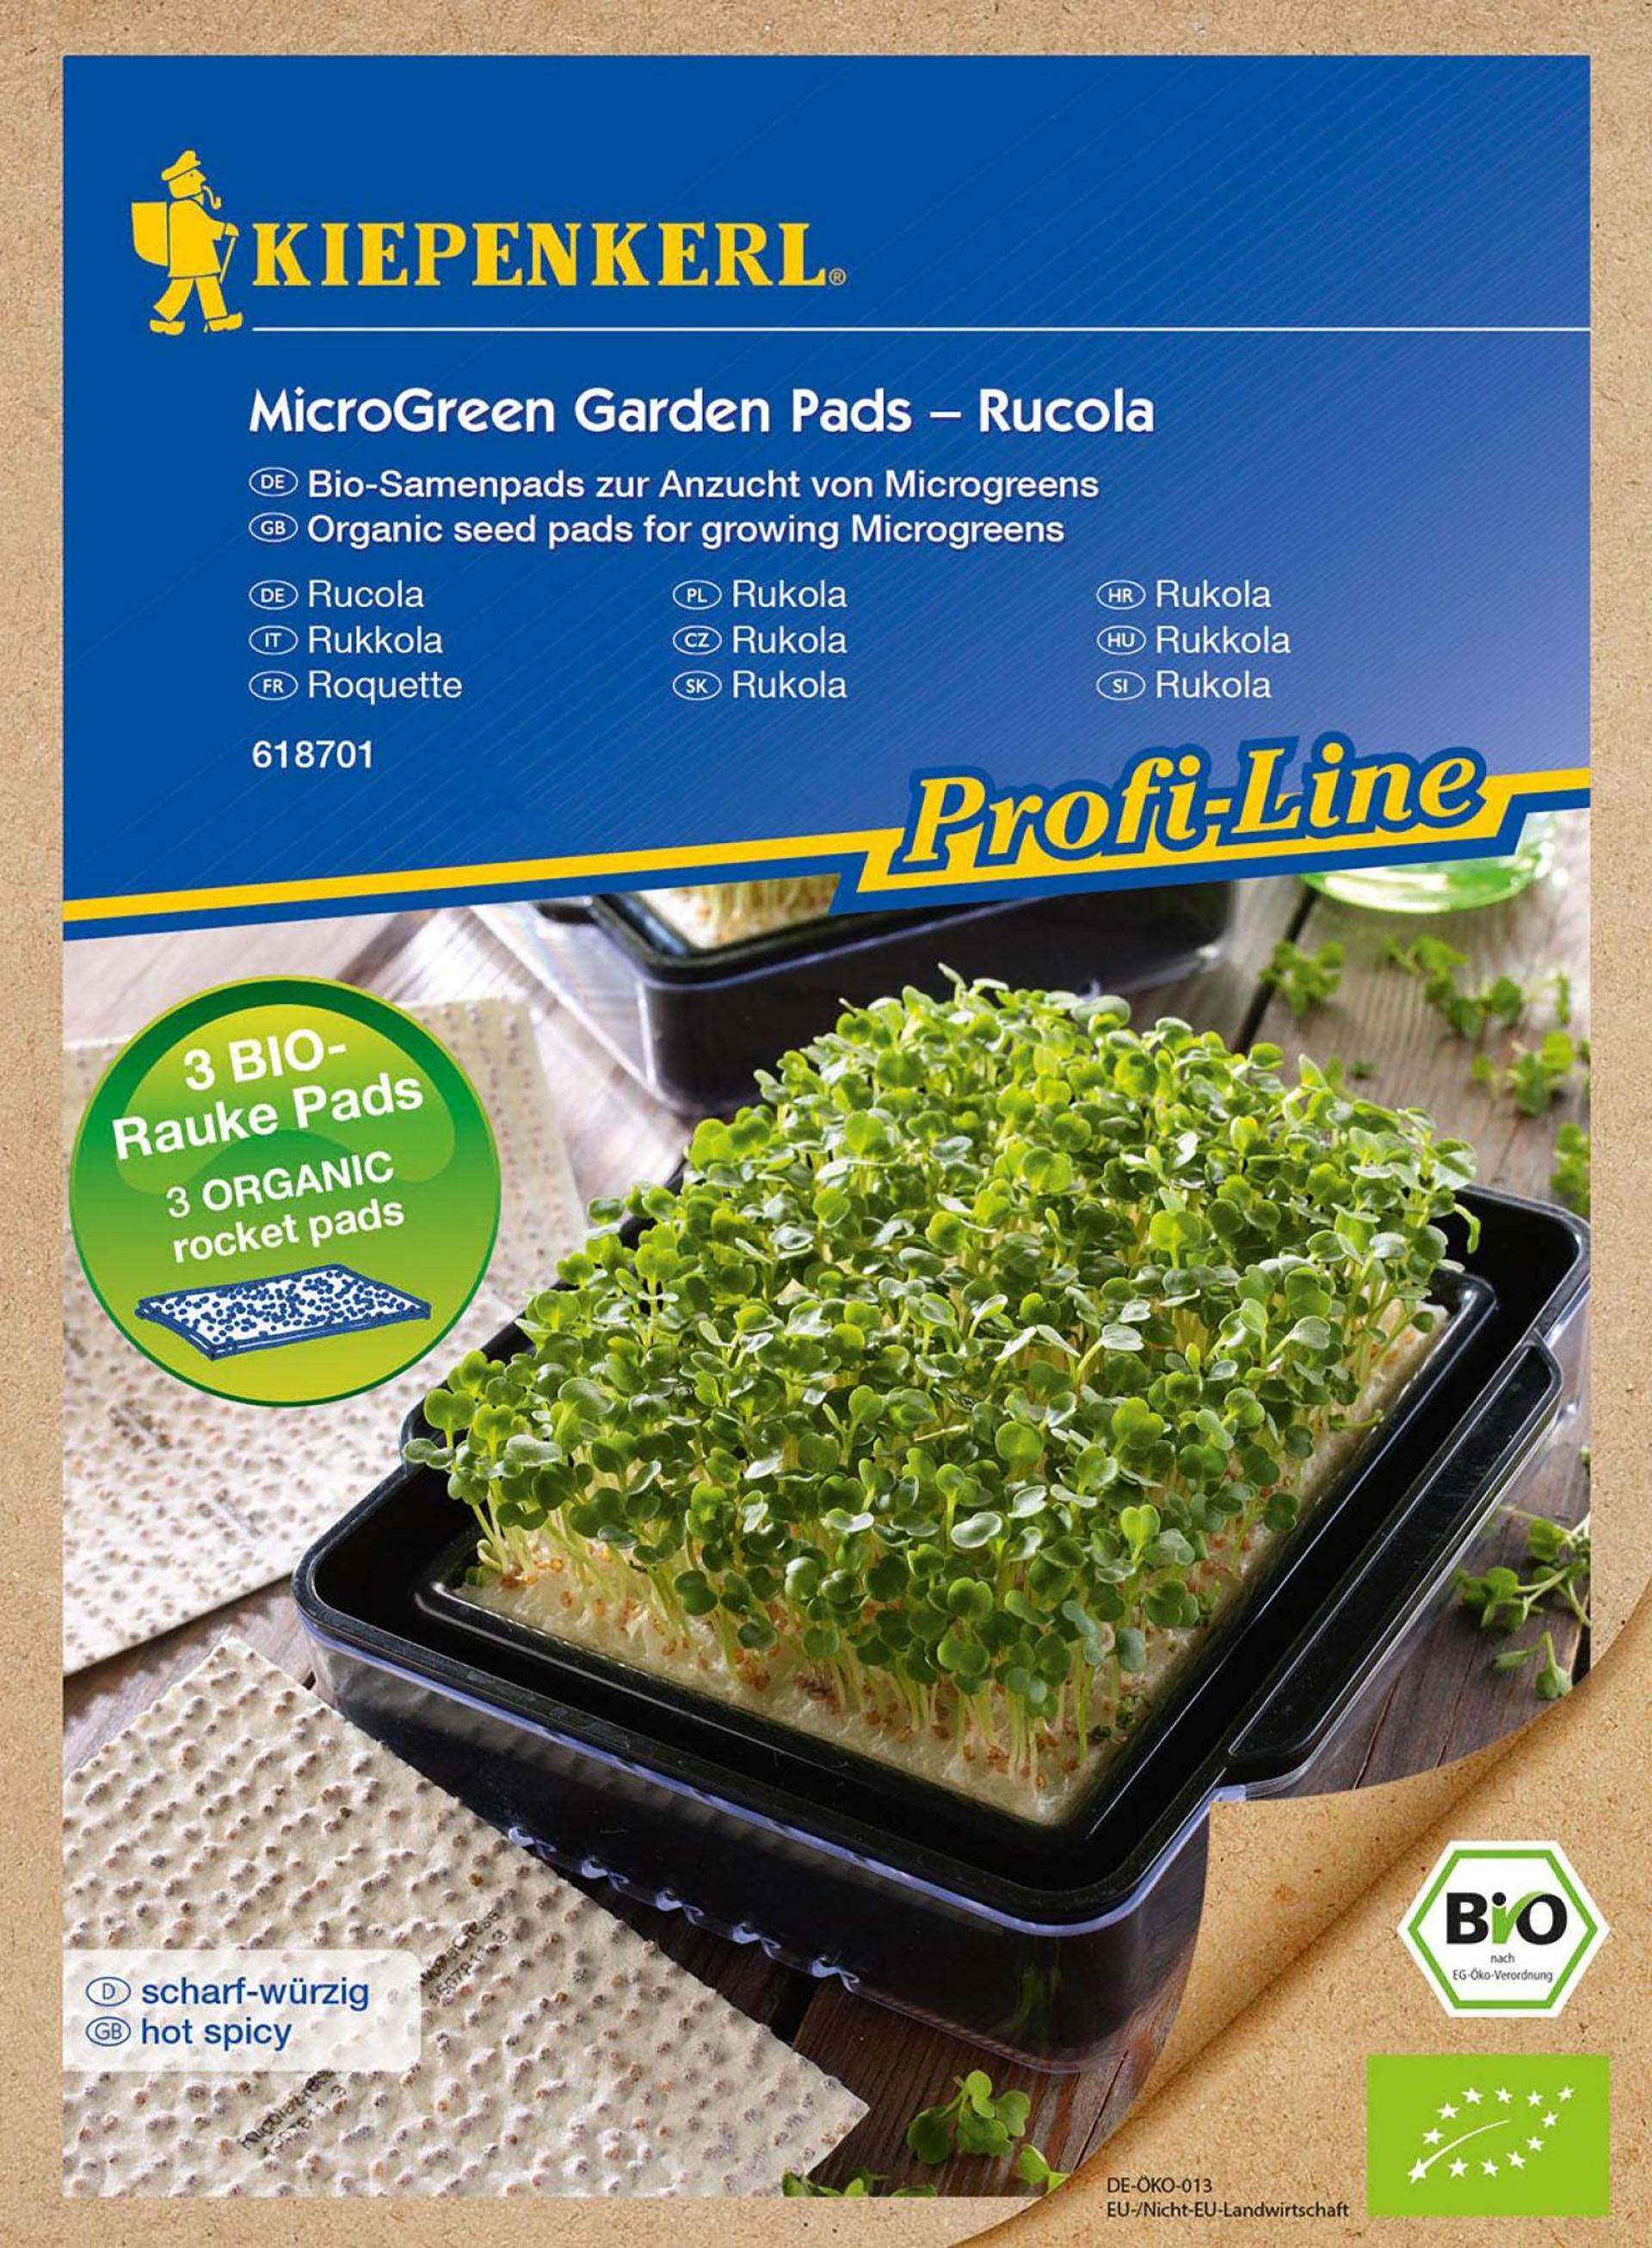 MicorGreen Garden BIO-Rucola Nachfüllpads PG-N